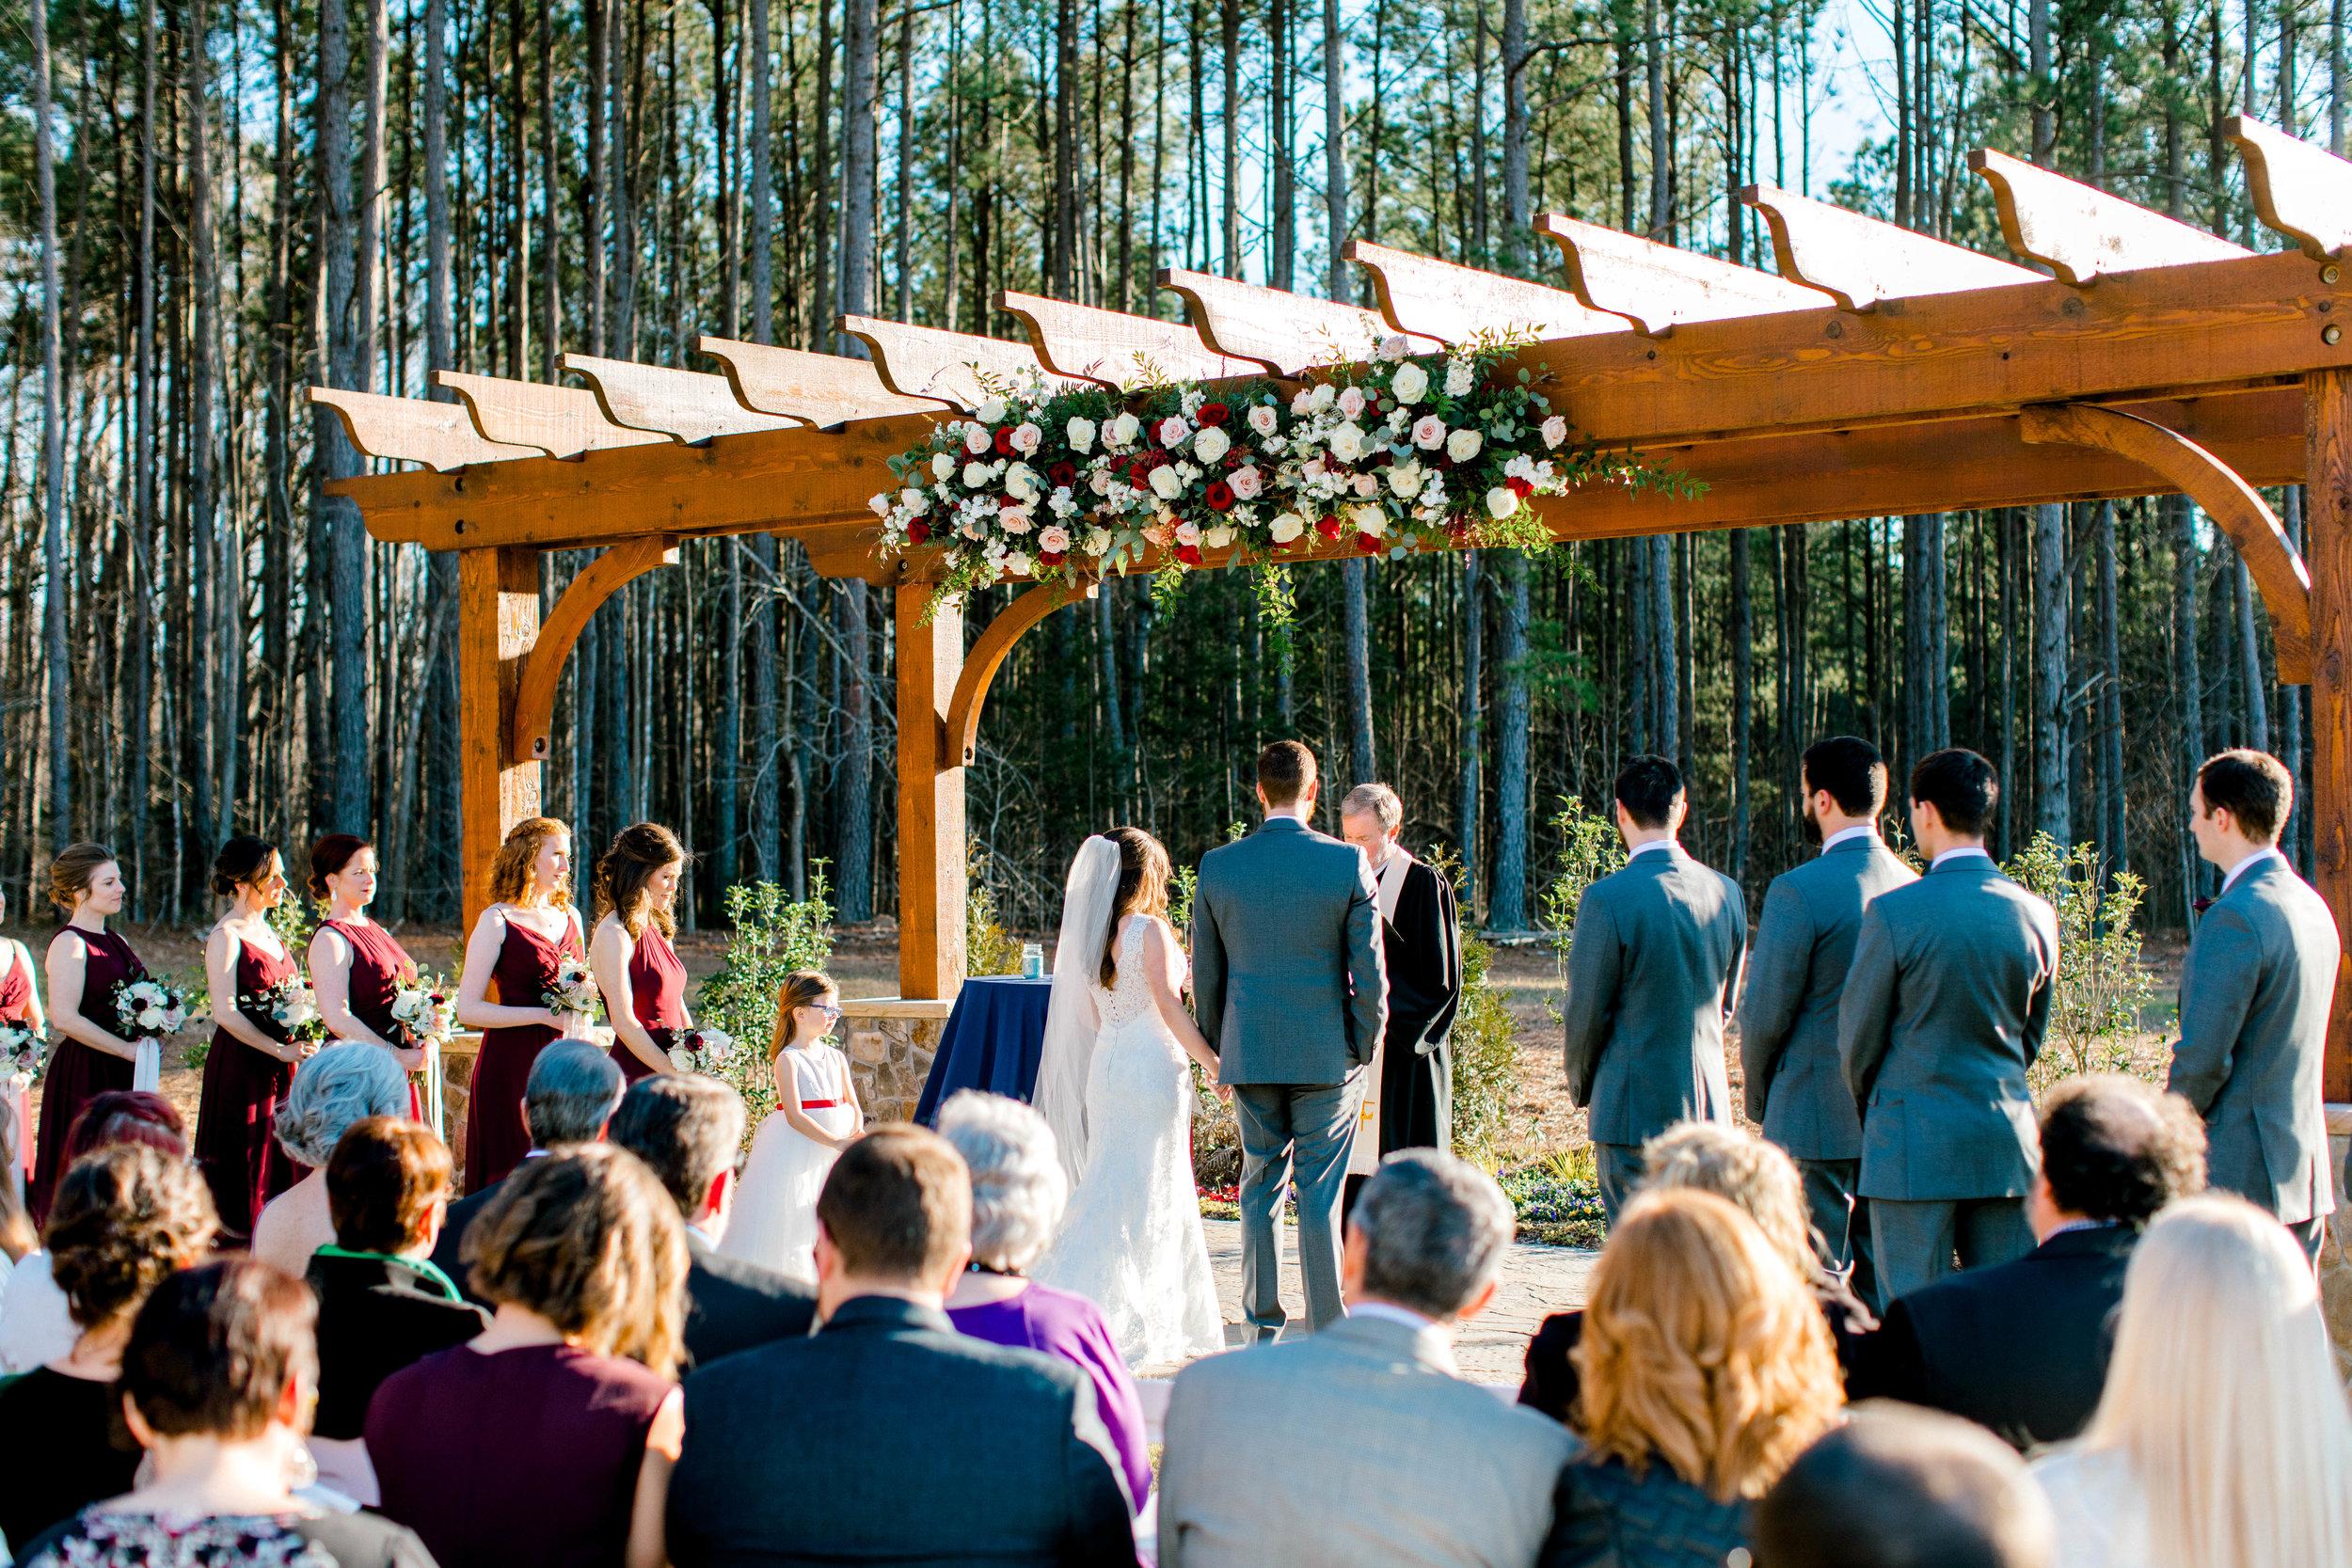 Ceremony_MelissaJonathanWedding-73.jpg